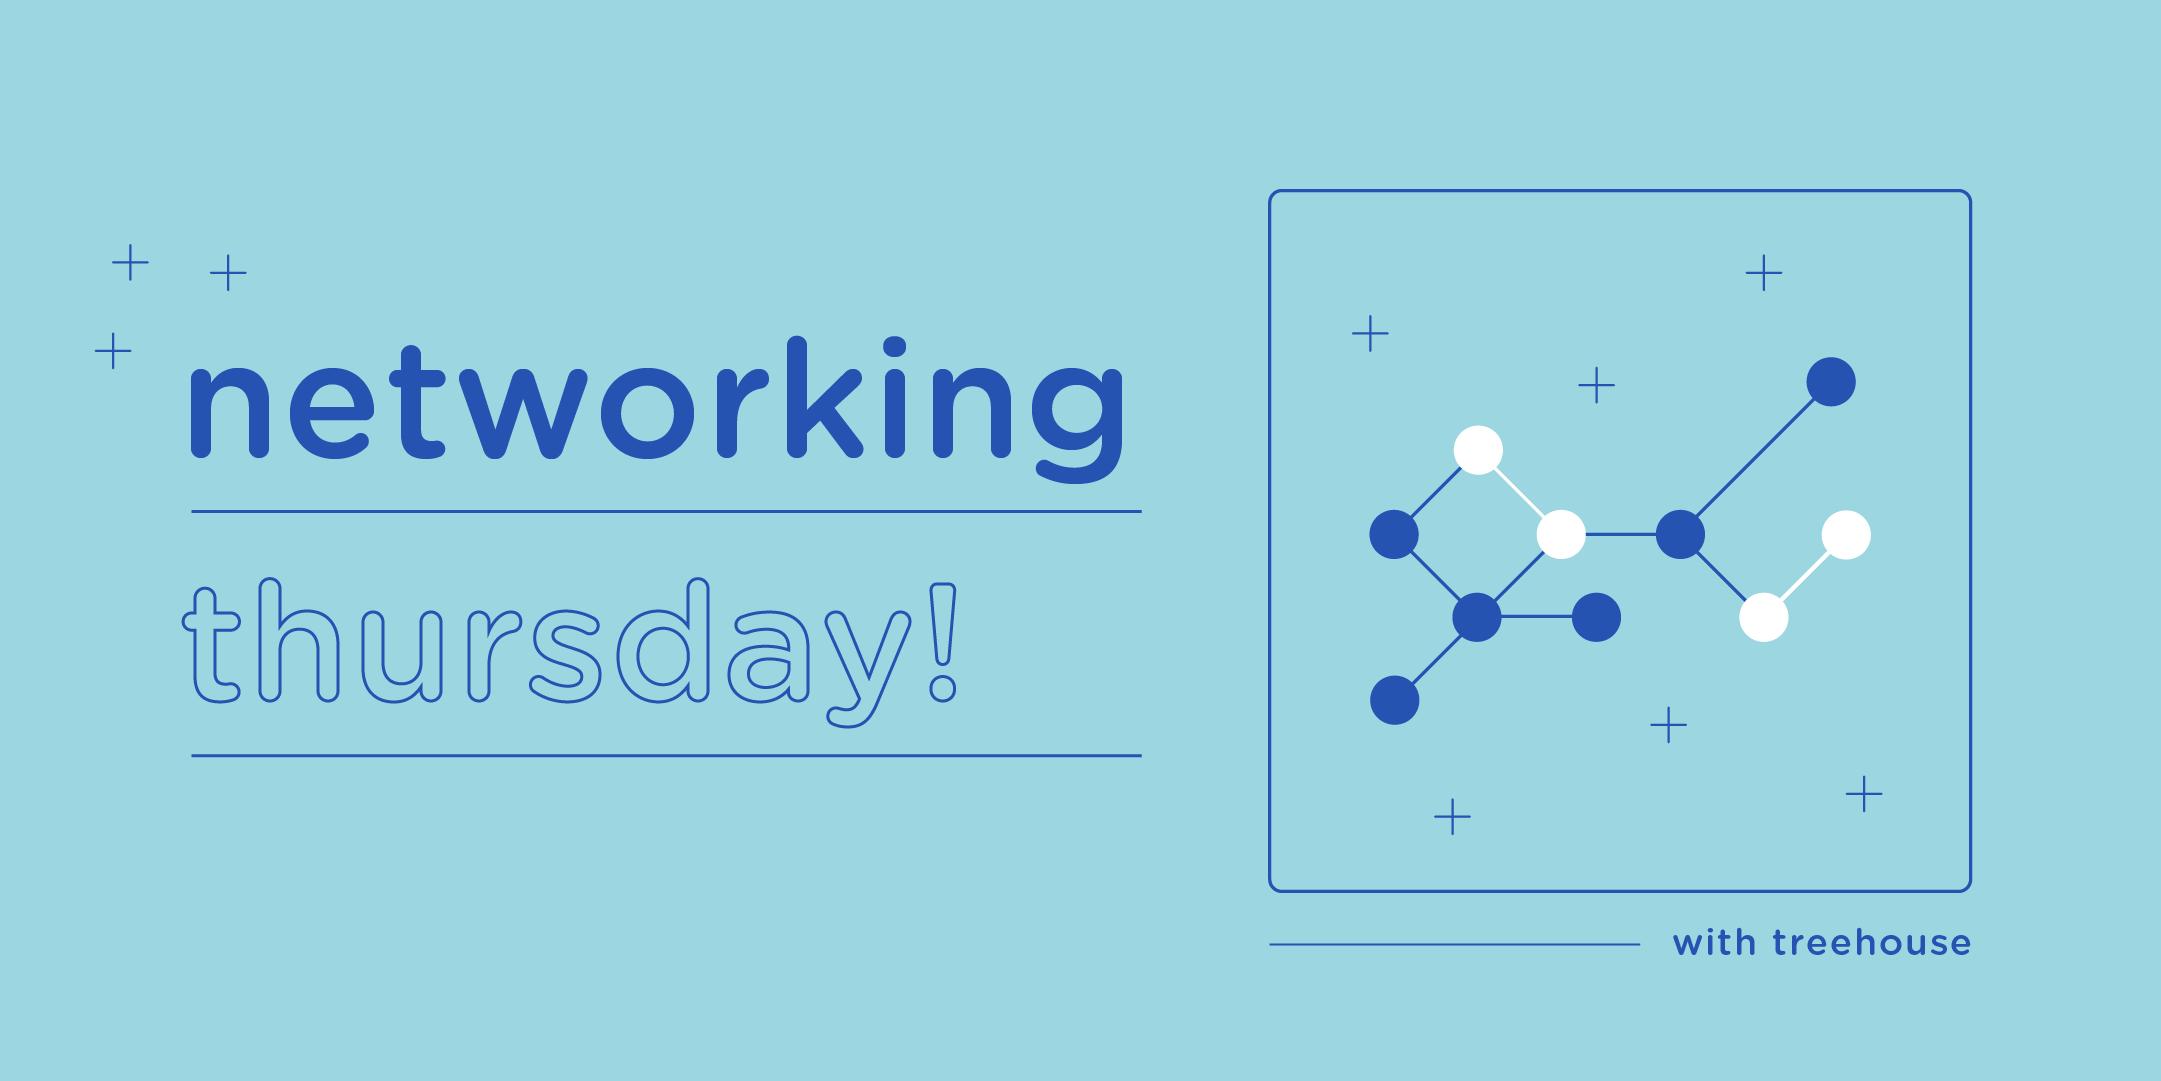 Networking Thursday